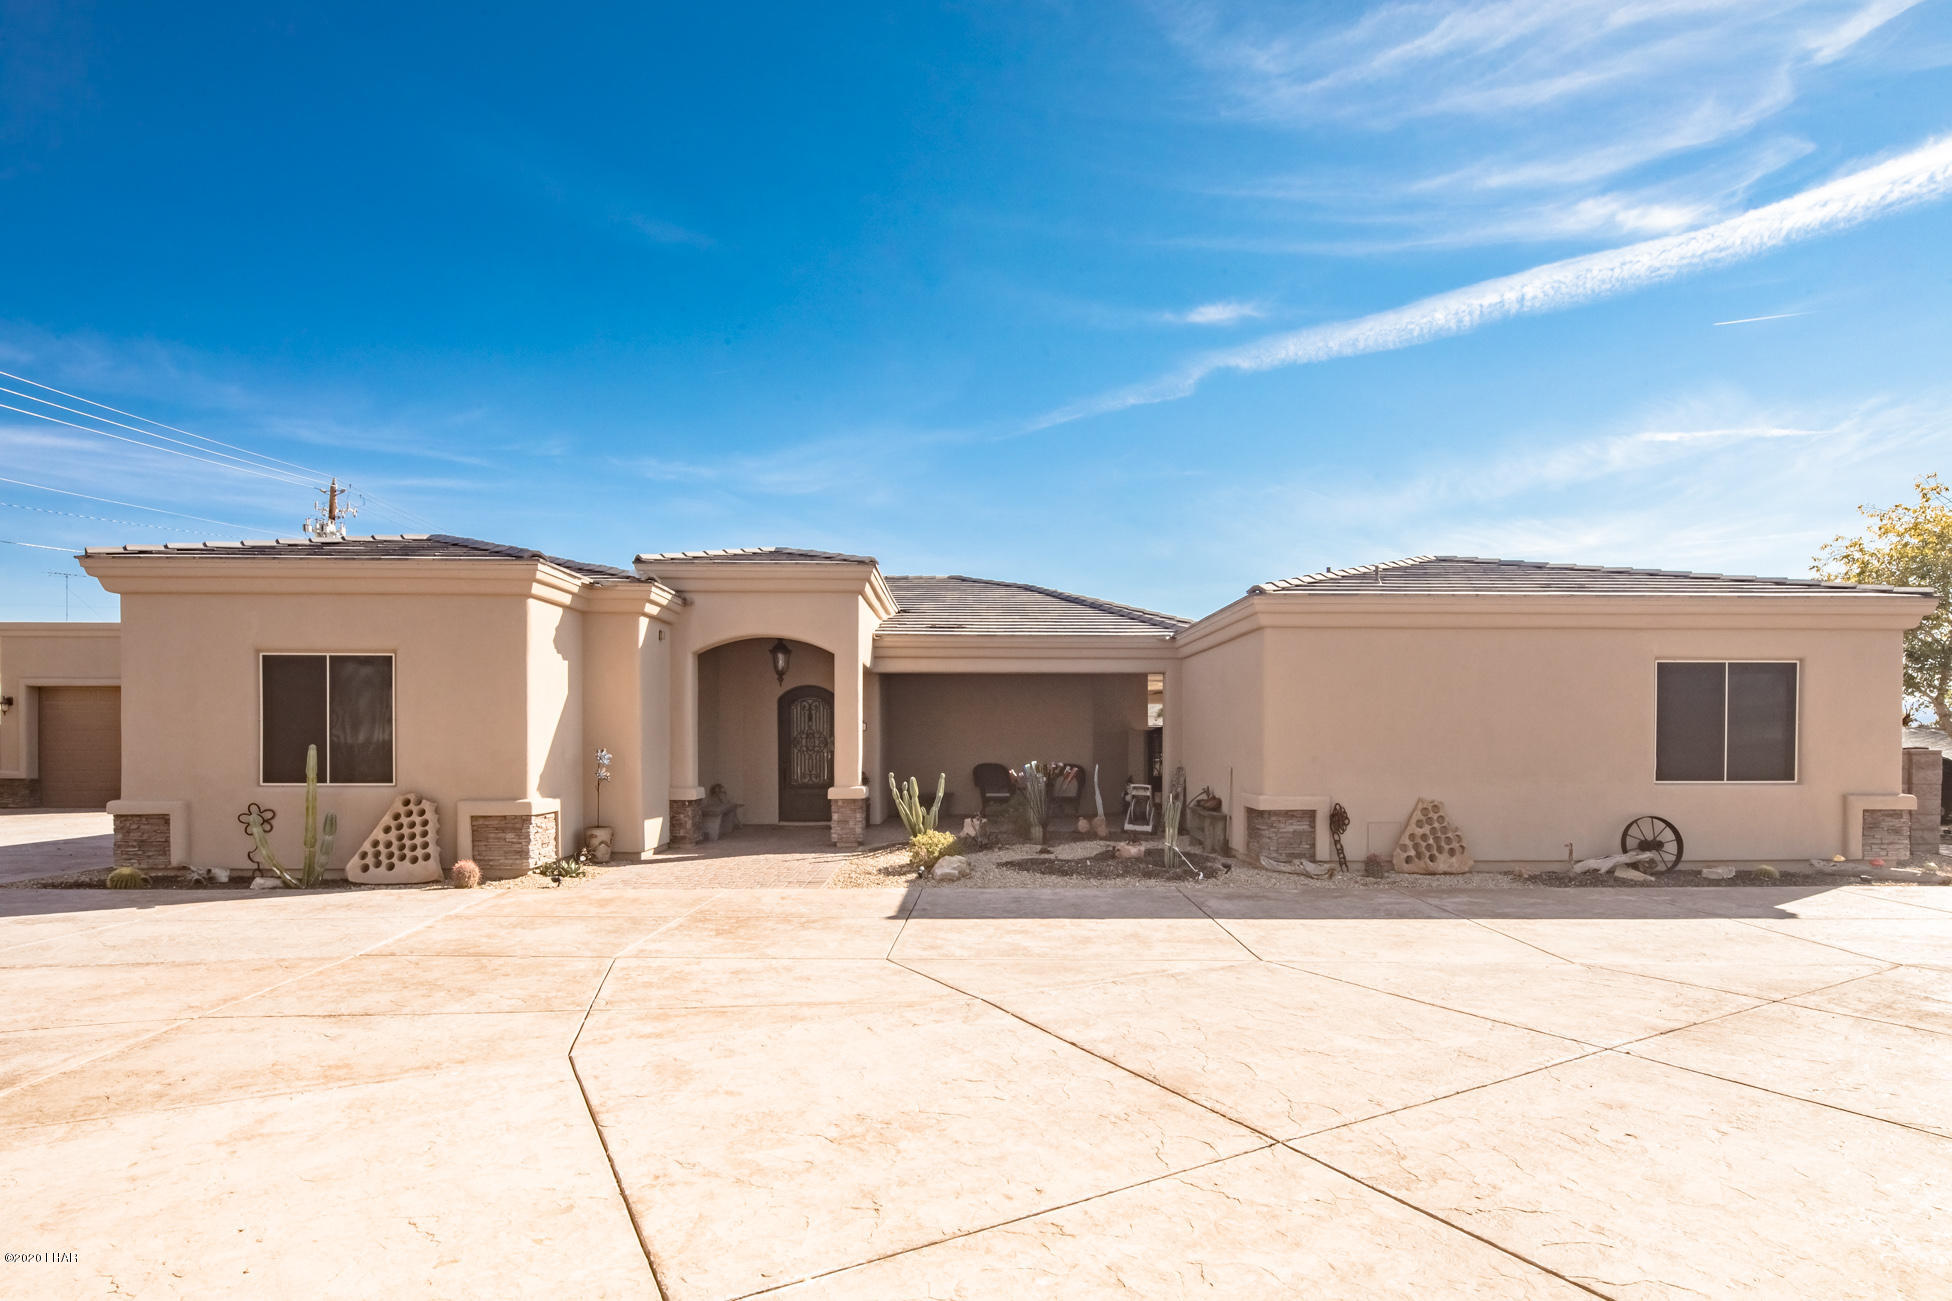 Photo of 2989 Appaloosa Ln, Lake Havasu City, AZ 86406